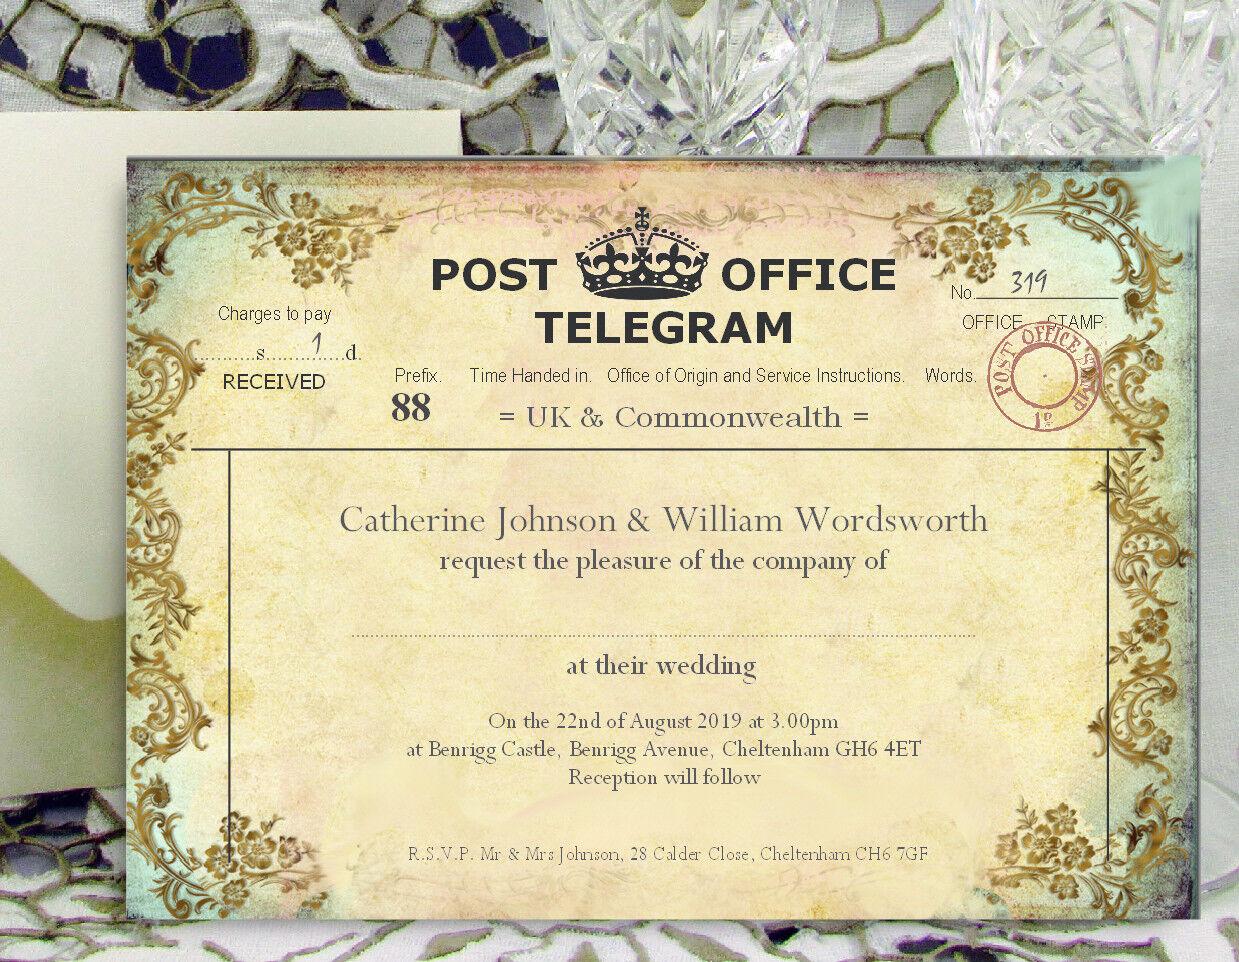 LARGE PERSONALISED WEDDING INVITATIONS 18x13cm Vintage Telegram F with Envelopes